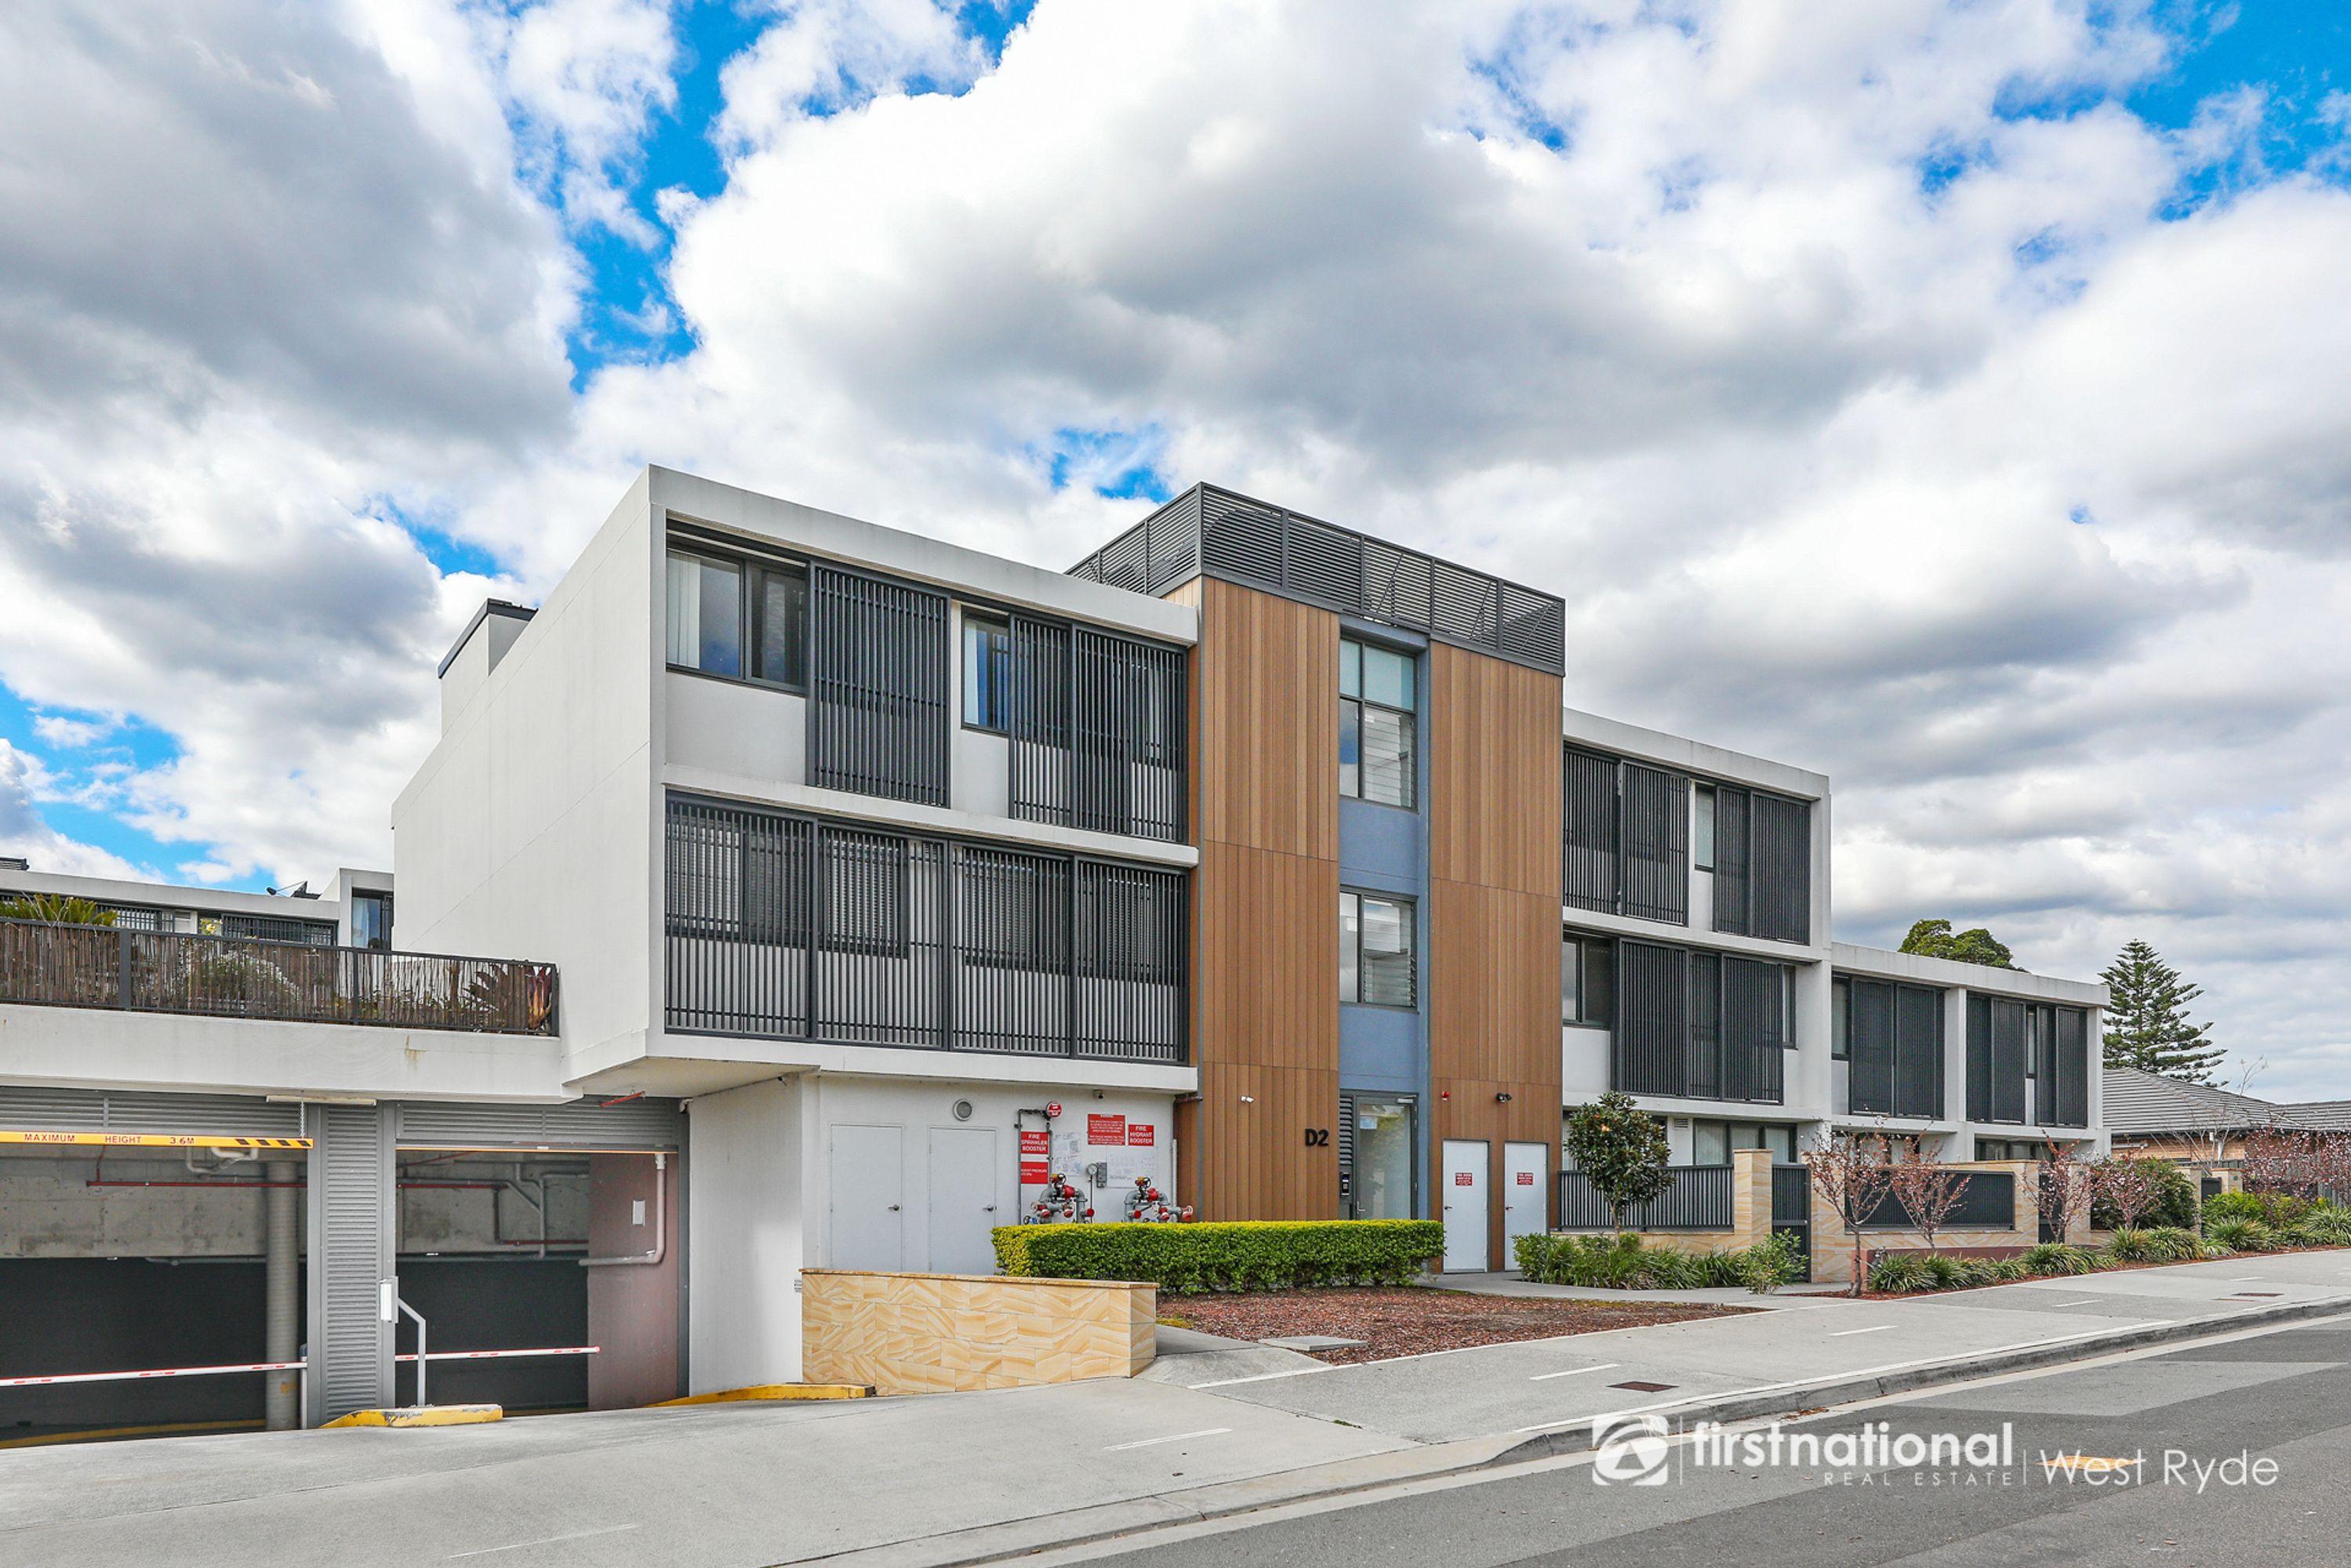 205D/1 Allengrove Crescent, North Ryde, NSW 2113